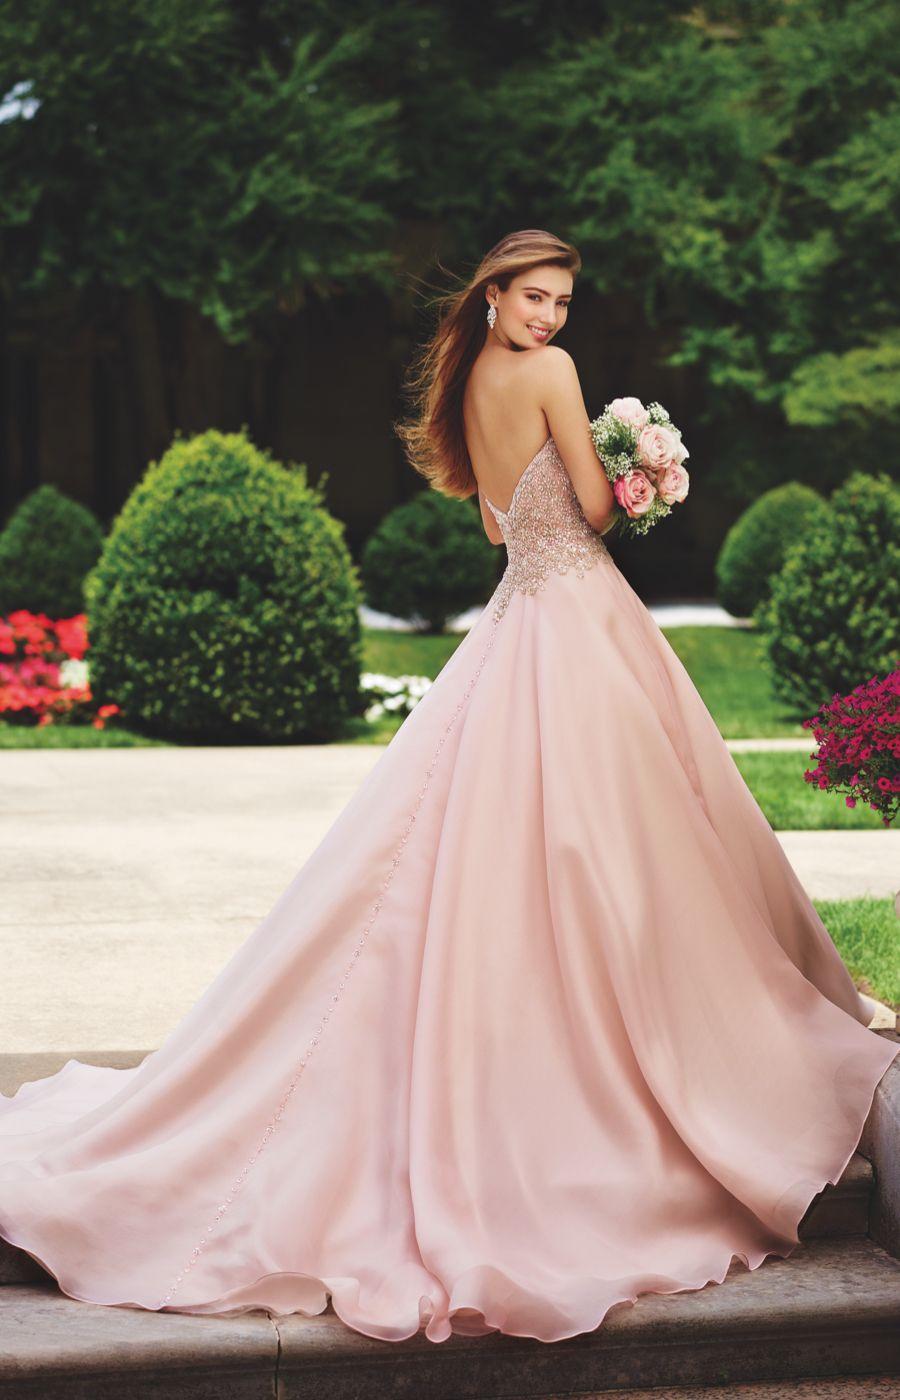 Dipped wedding dress  The gorgeous  David Tutera for Mon Cheri bridal collection